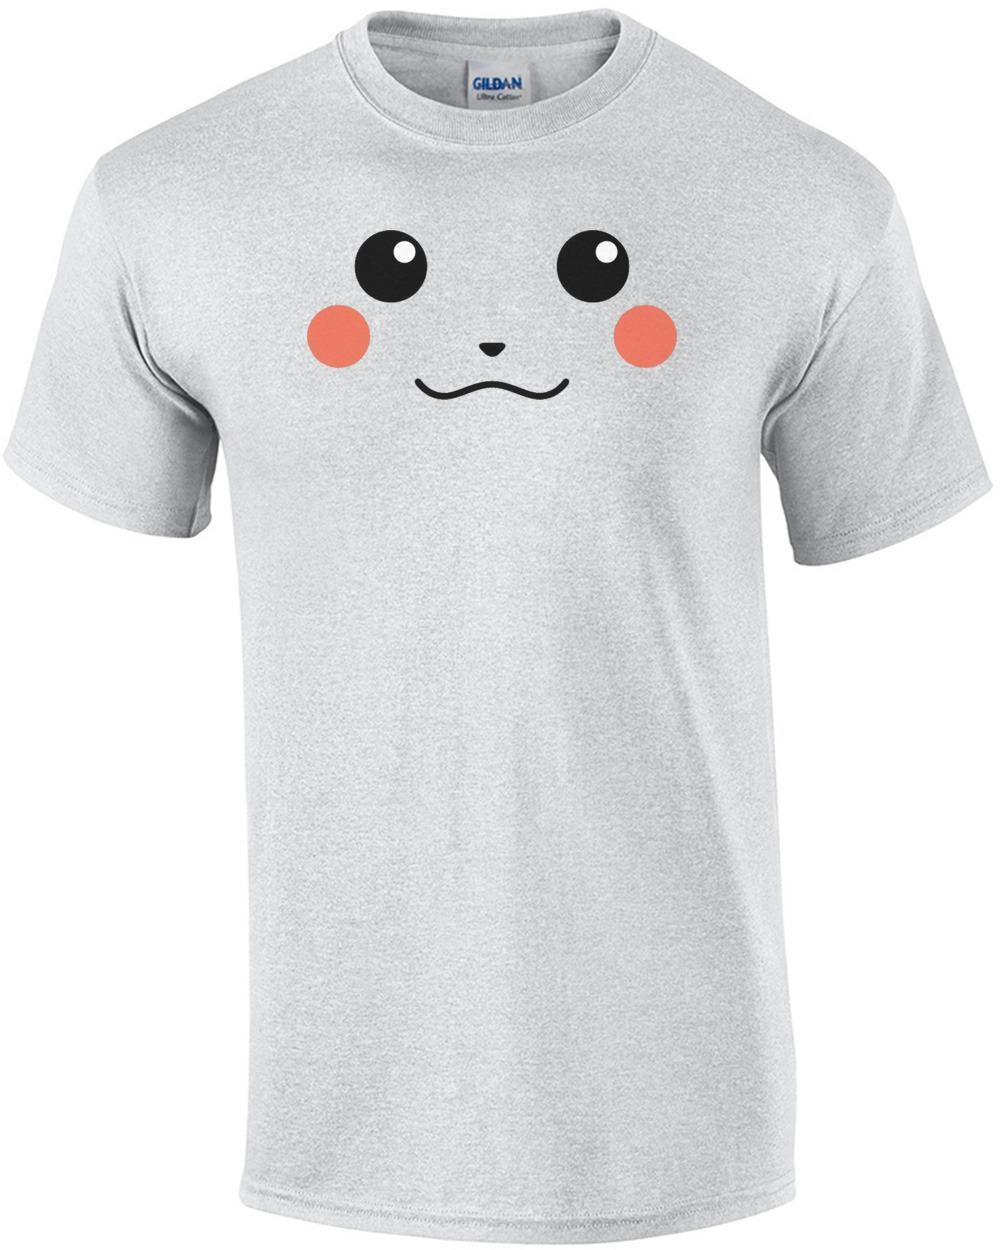 084e9731 pikachu-pokemon-shirt-mens-regular-ash_1.jpg